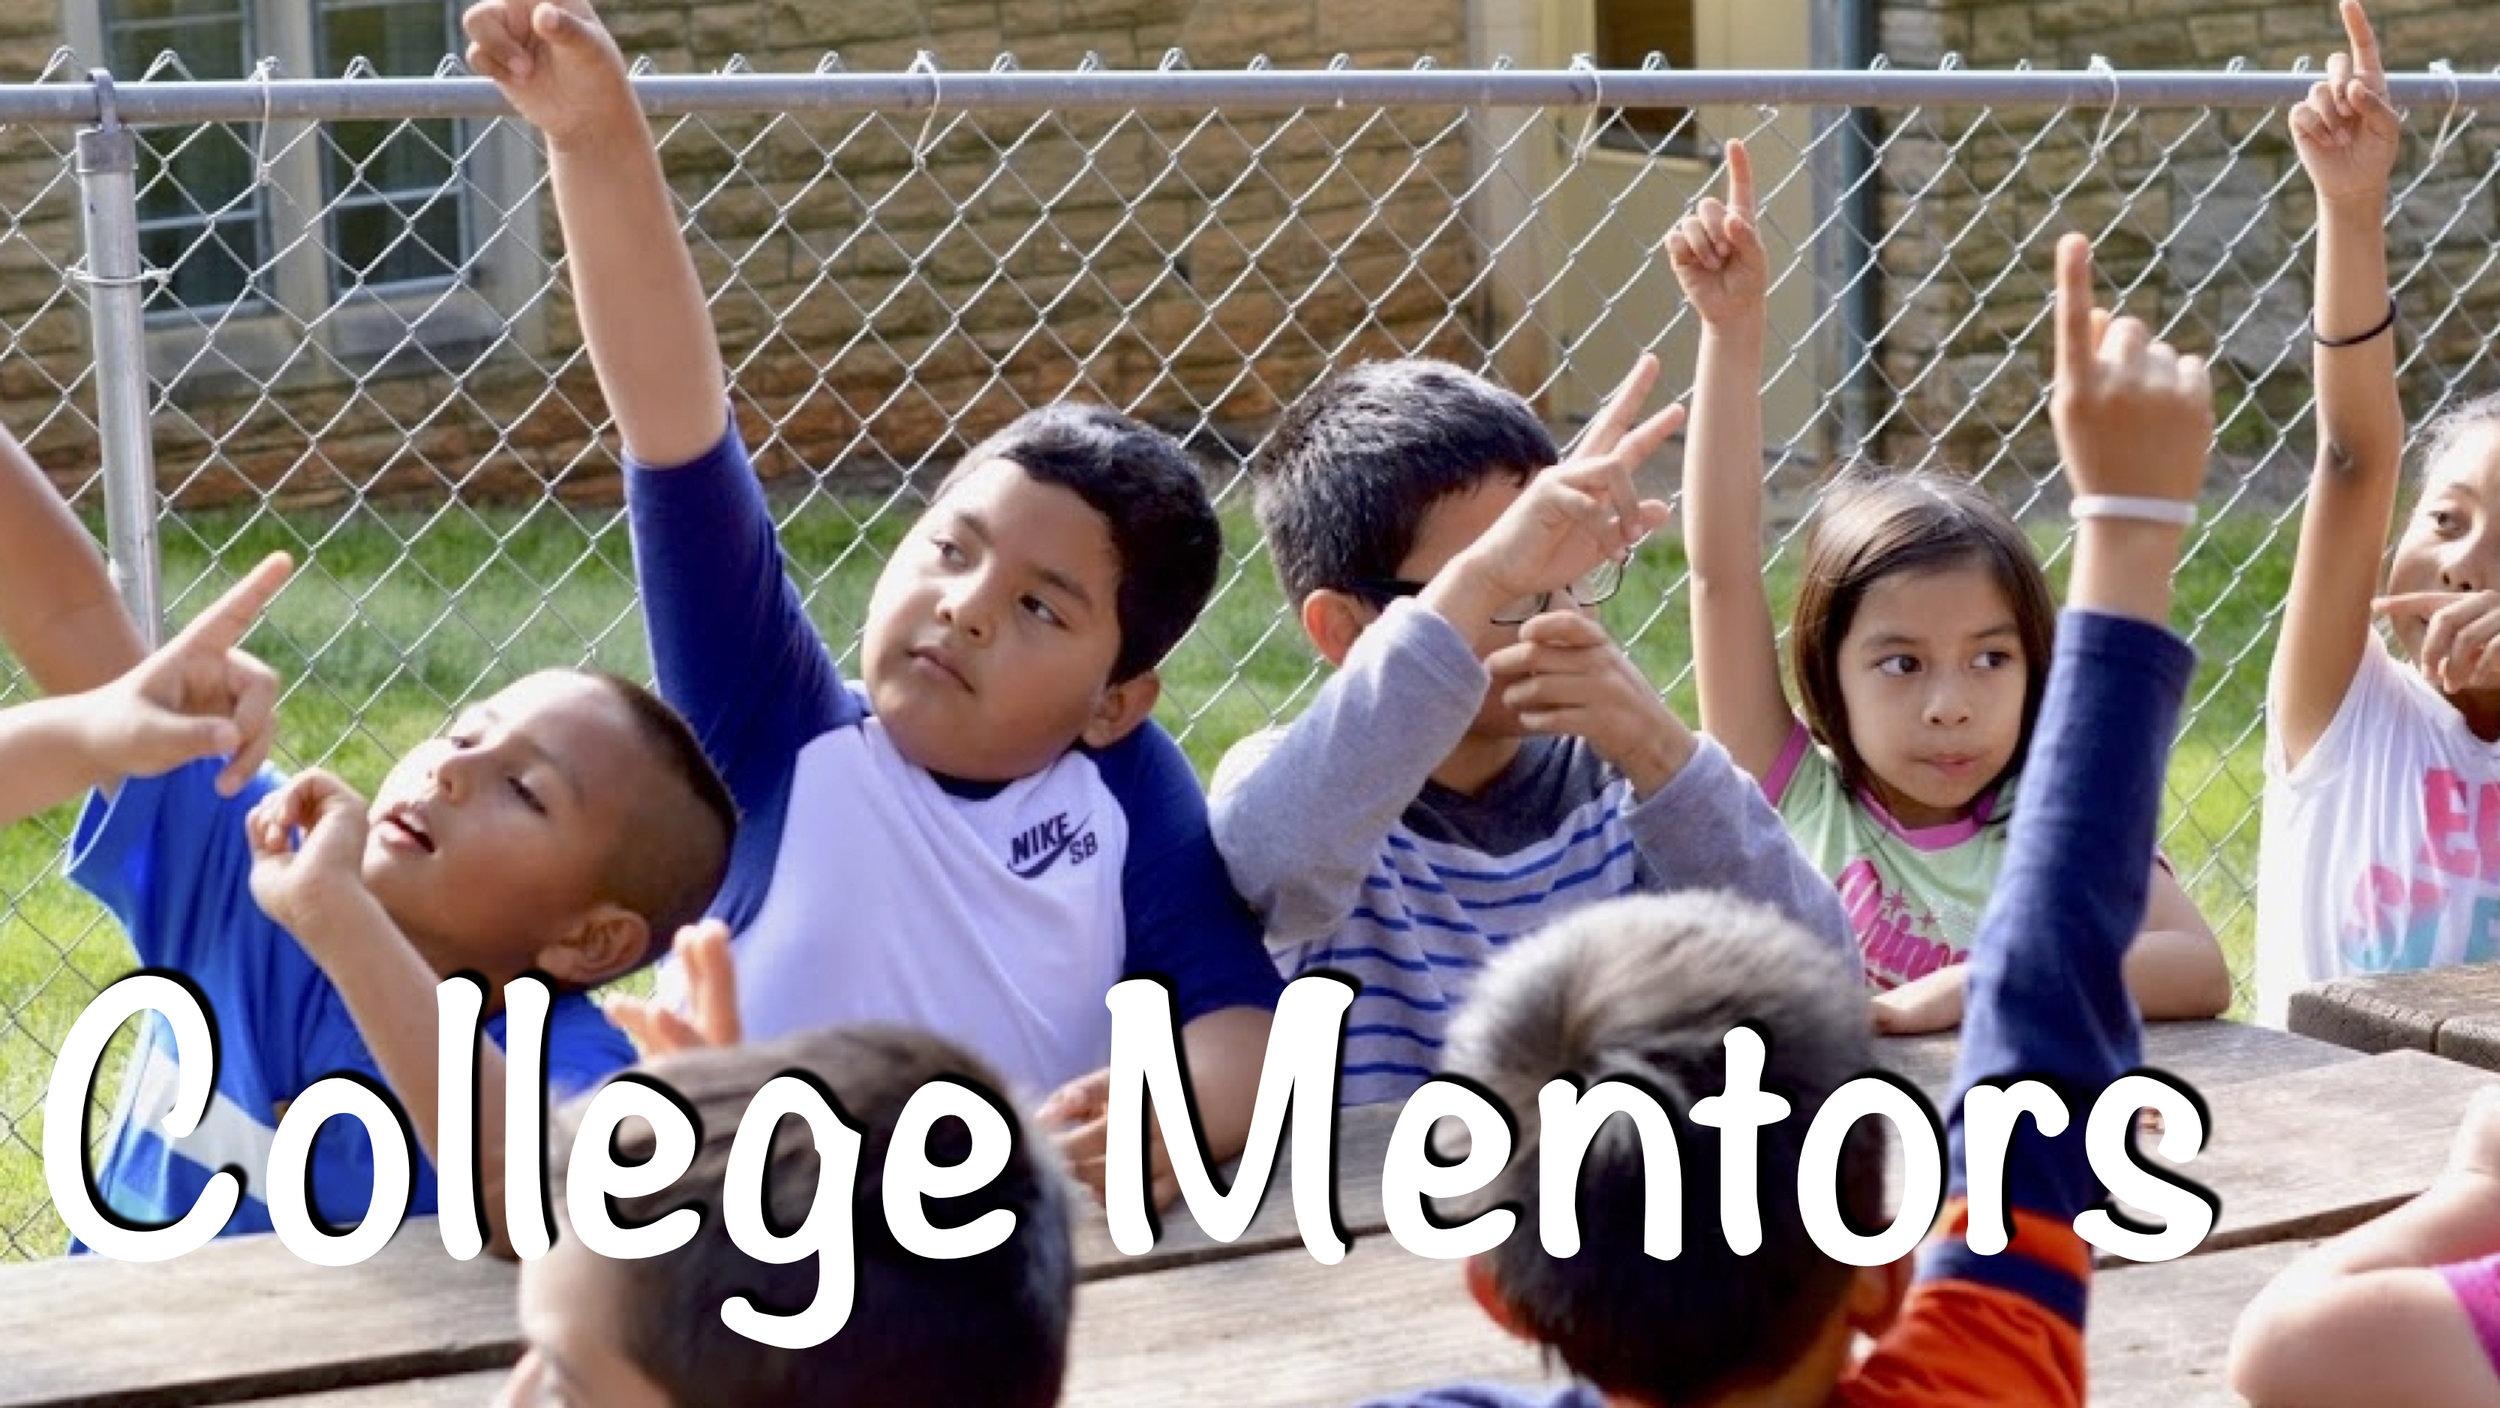 College mentors fb.jpg